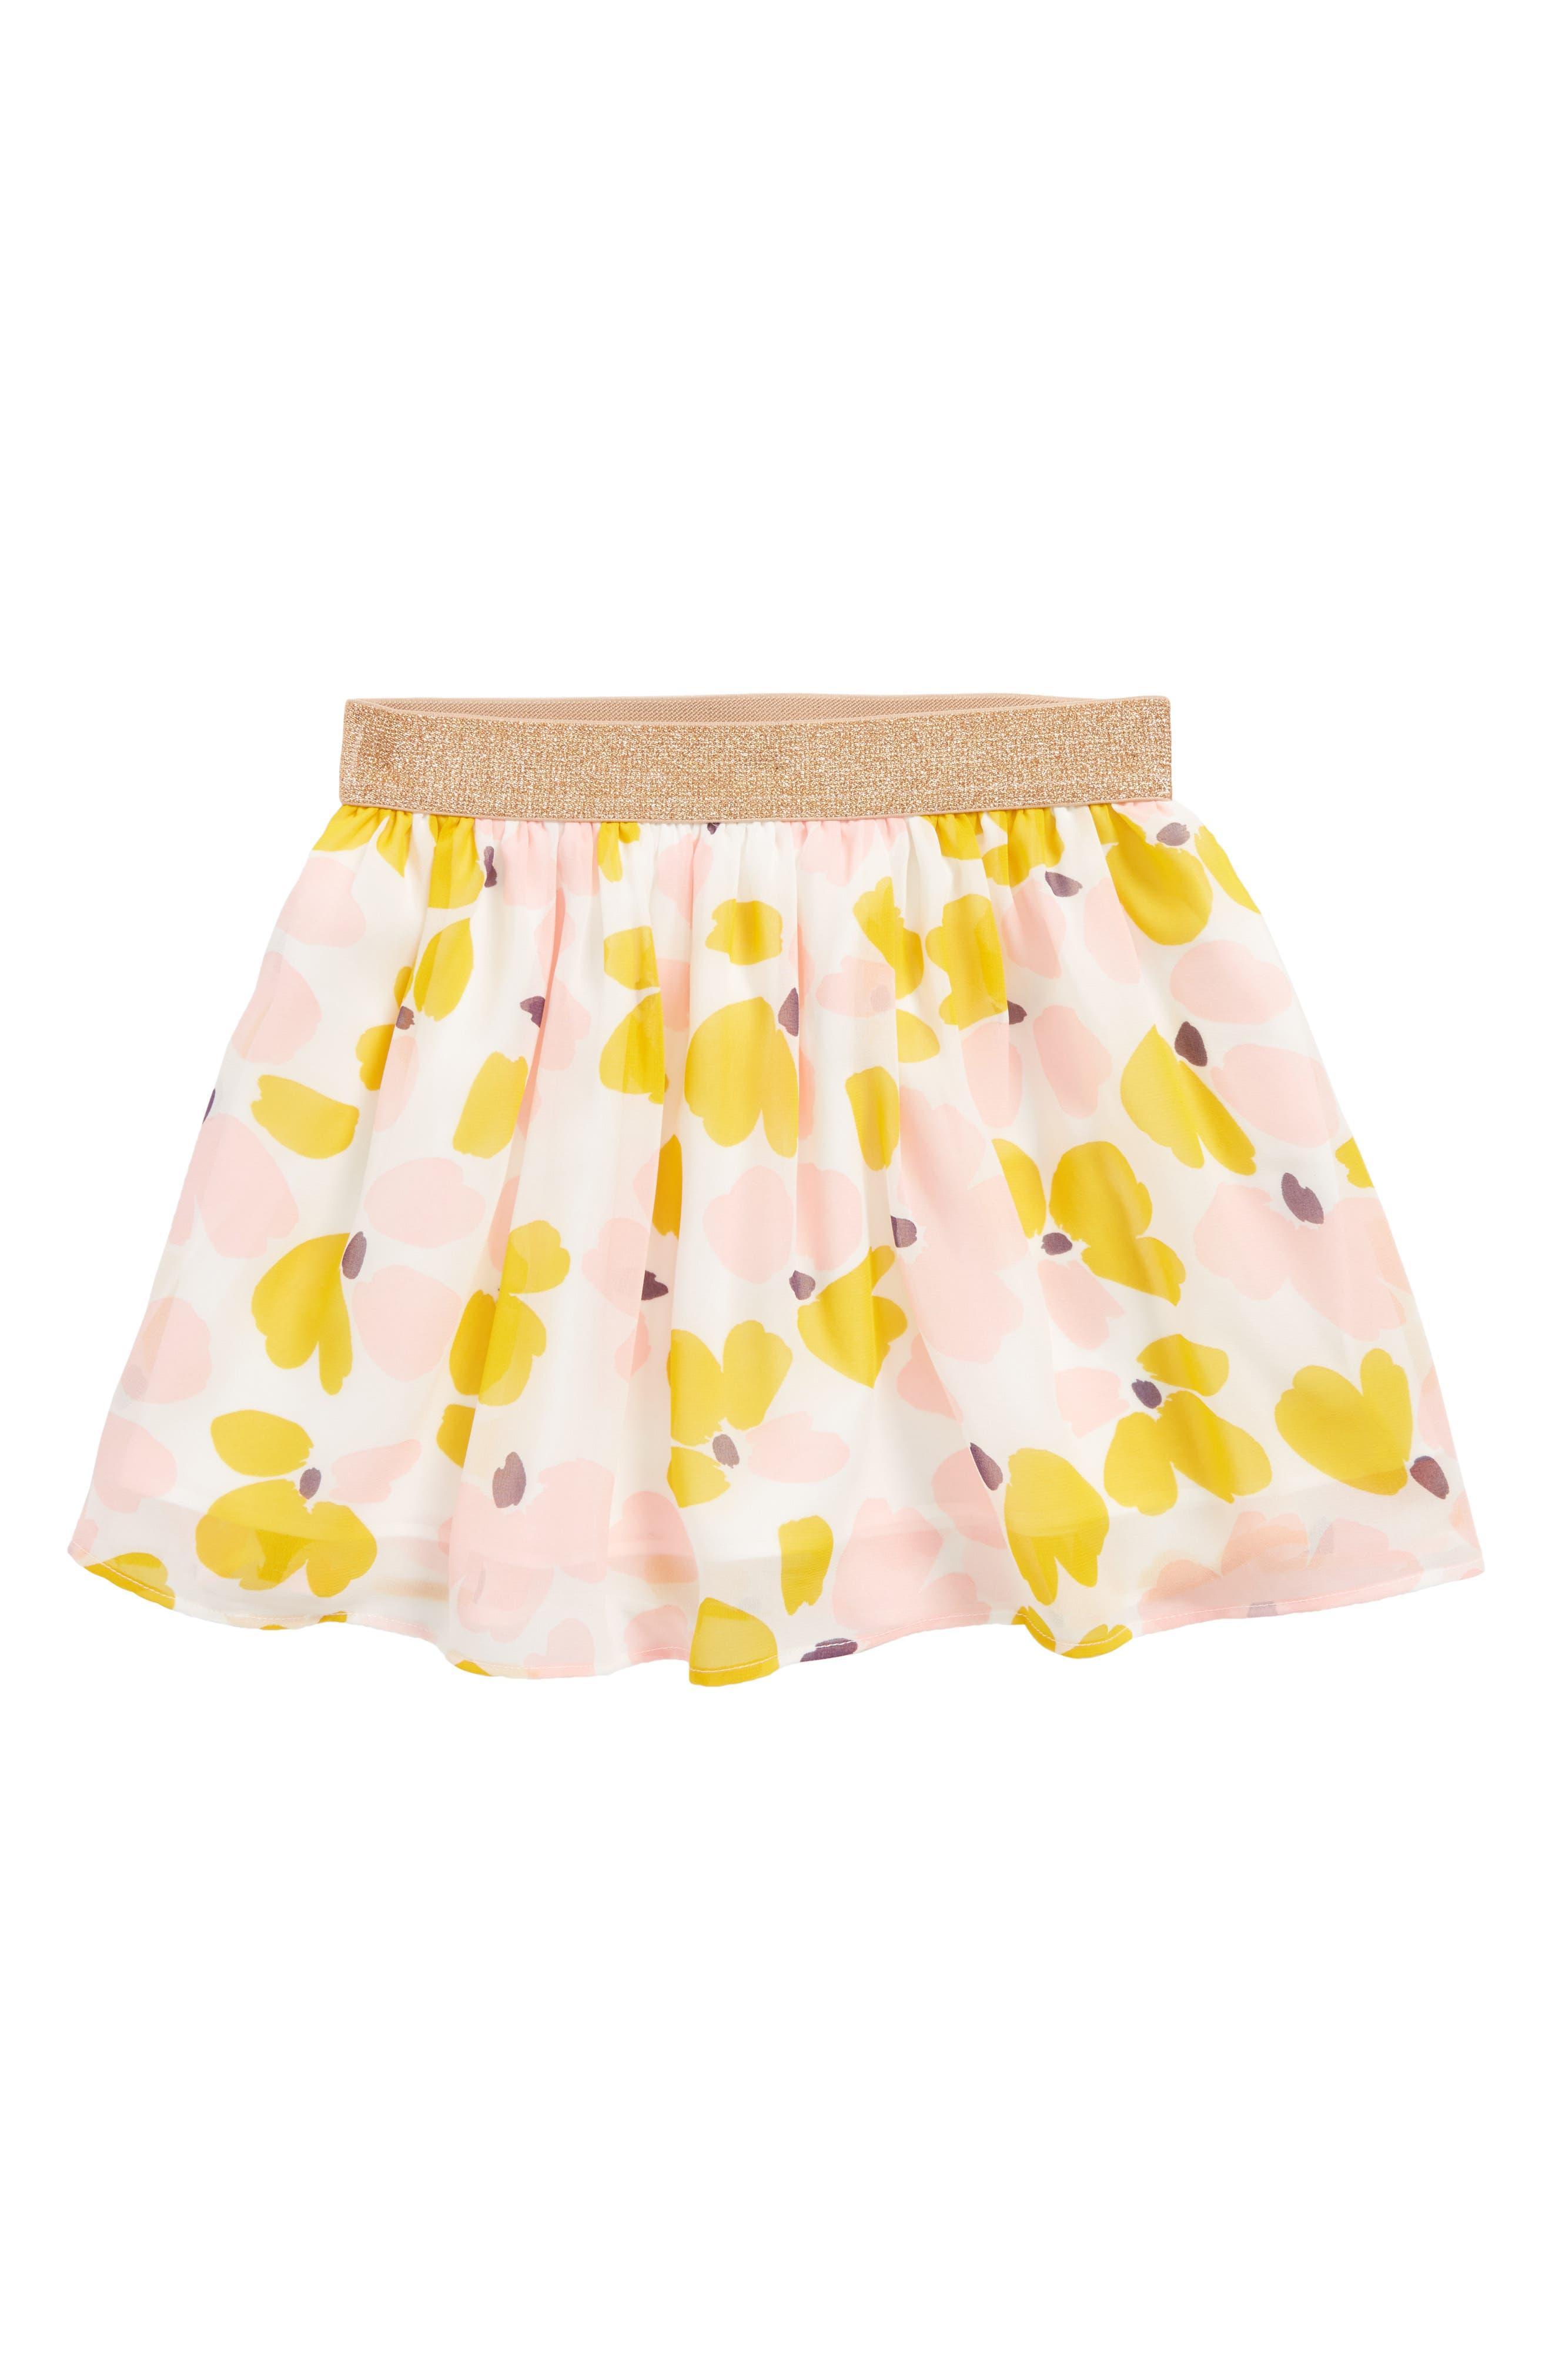 kate spade new york coreen skirt (Toddler girls & Little Girls)